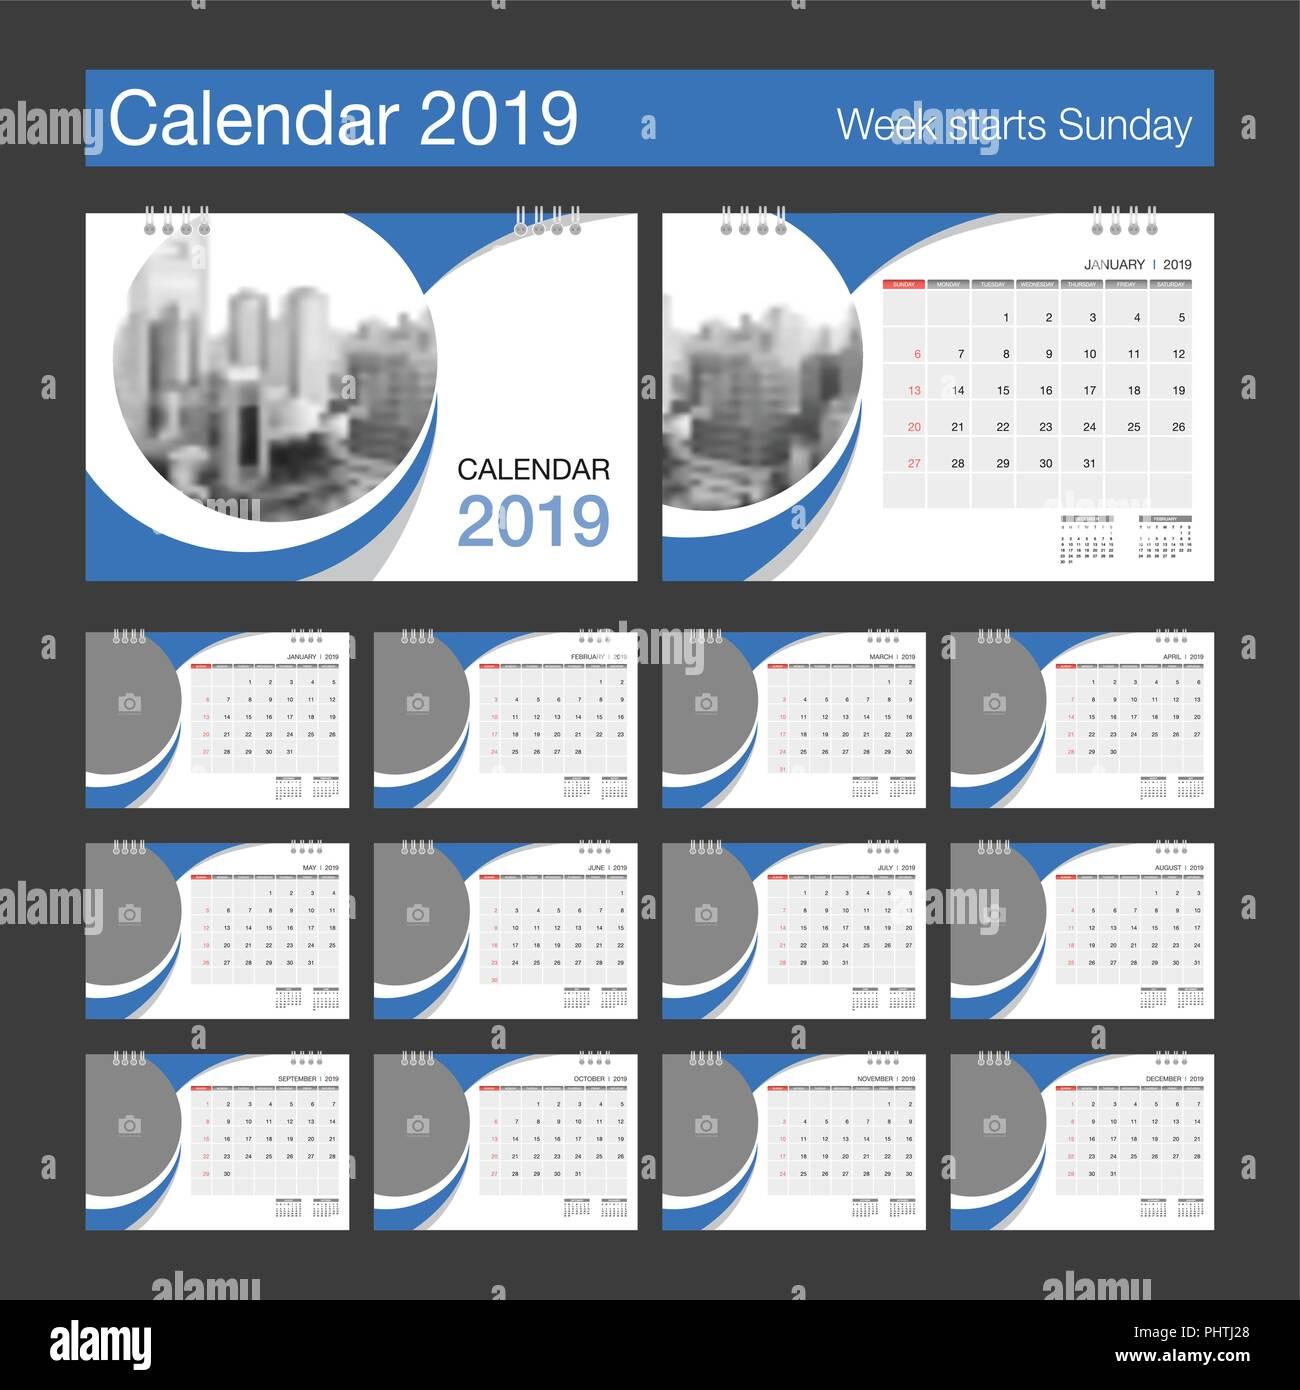 Calendar Design Size : Calendar desk modern design template with